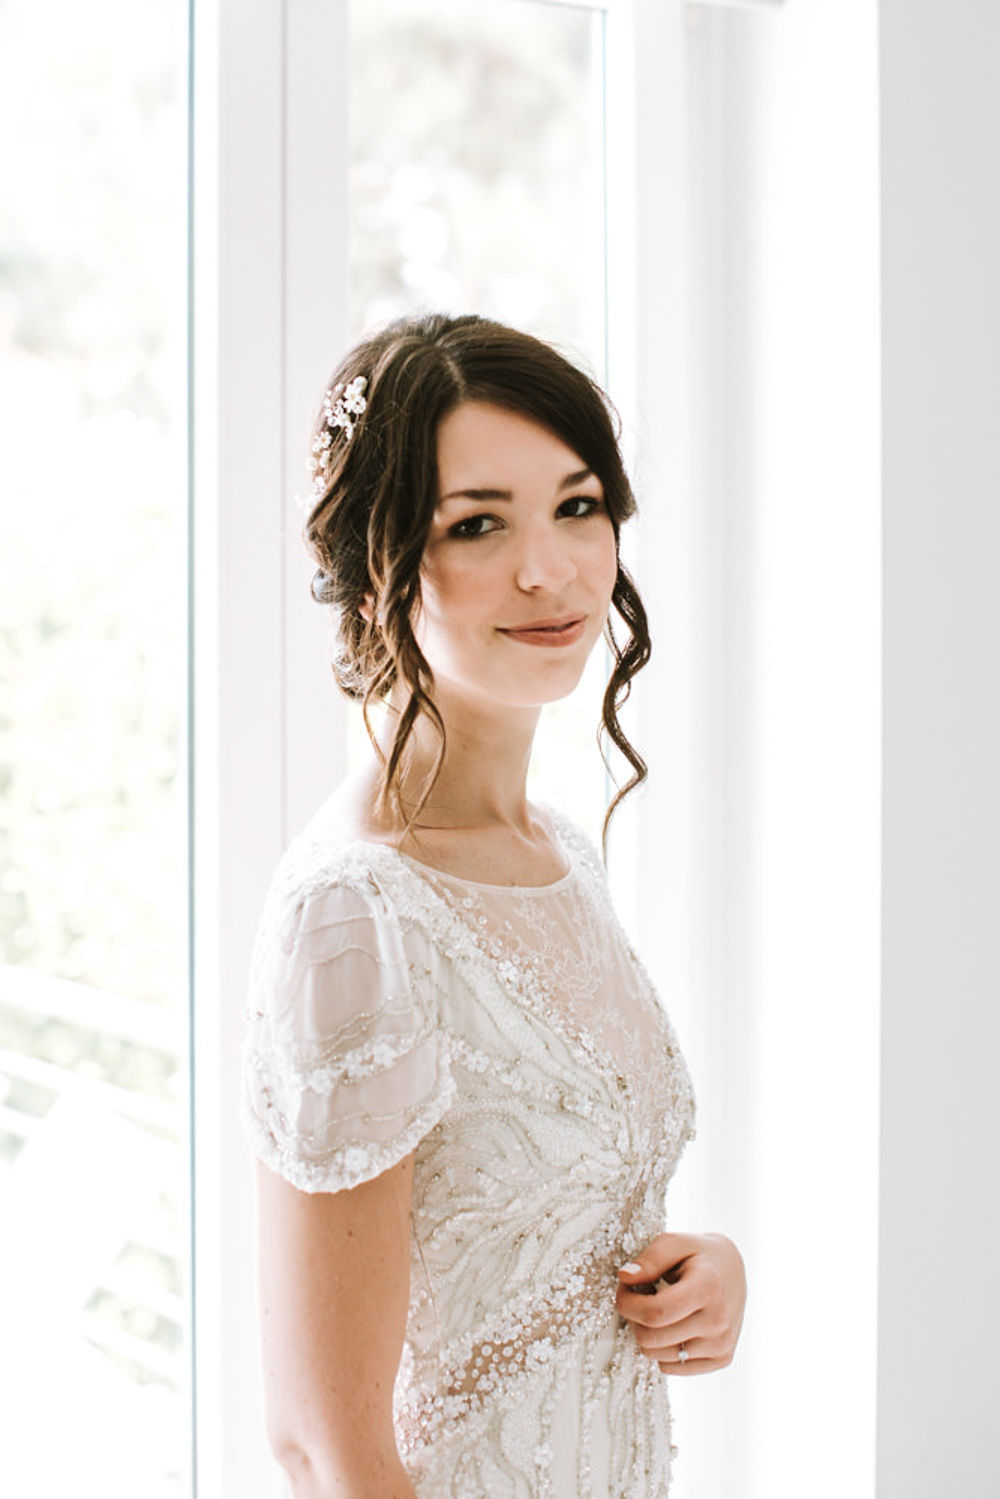 Bride Bridal Up Do Loose Curl Hair Vine Beaded Dress Jenny Packham Portugal Destination Wedding Ana Parker Photography